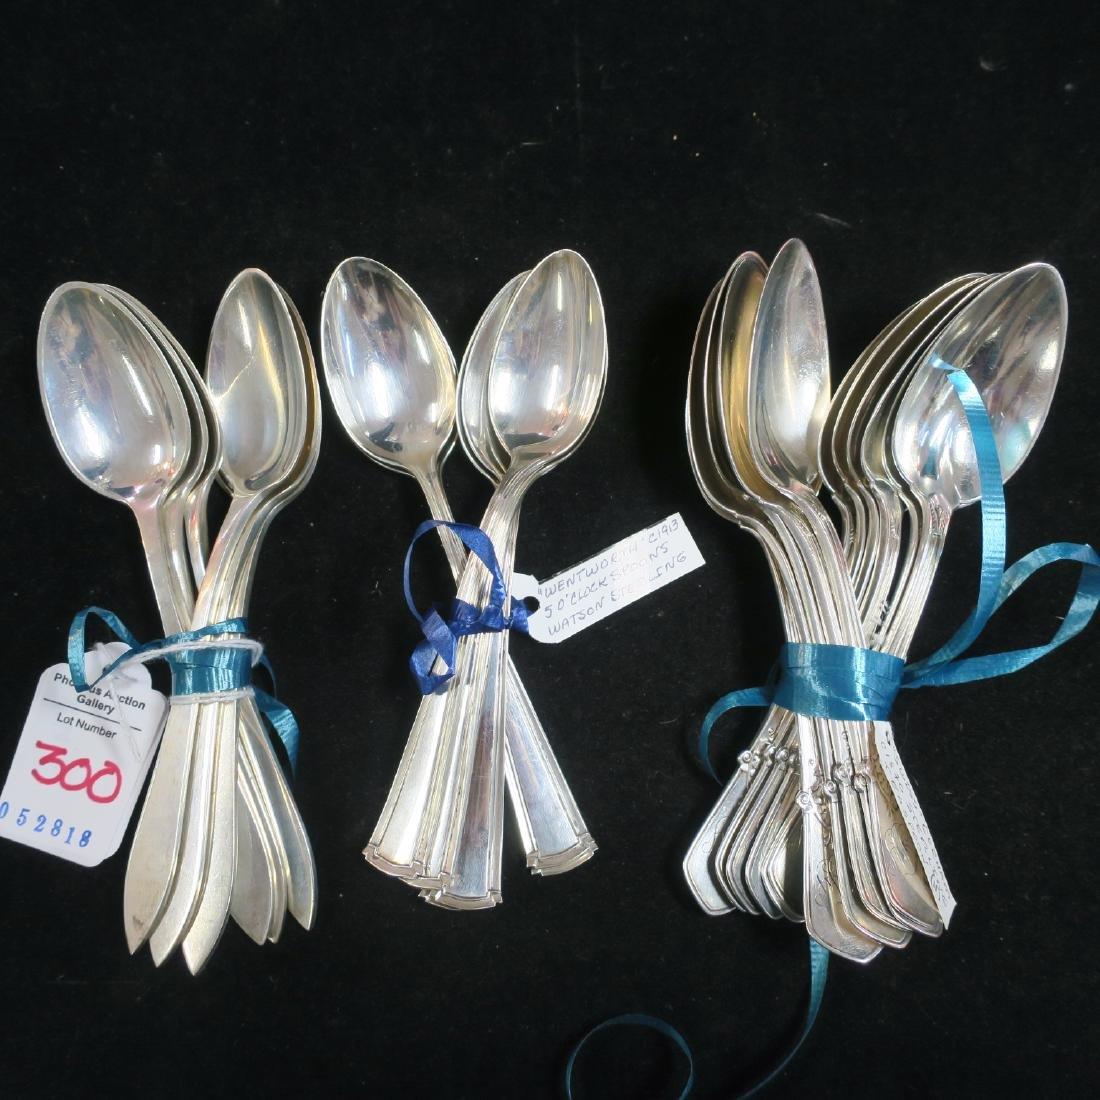 GORHAM, STEIFF & WATSON Sterling Silver Spoons: